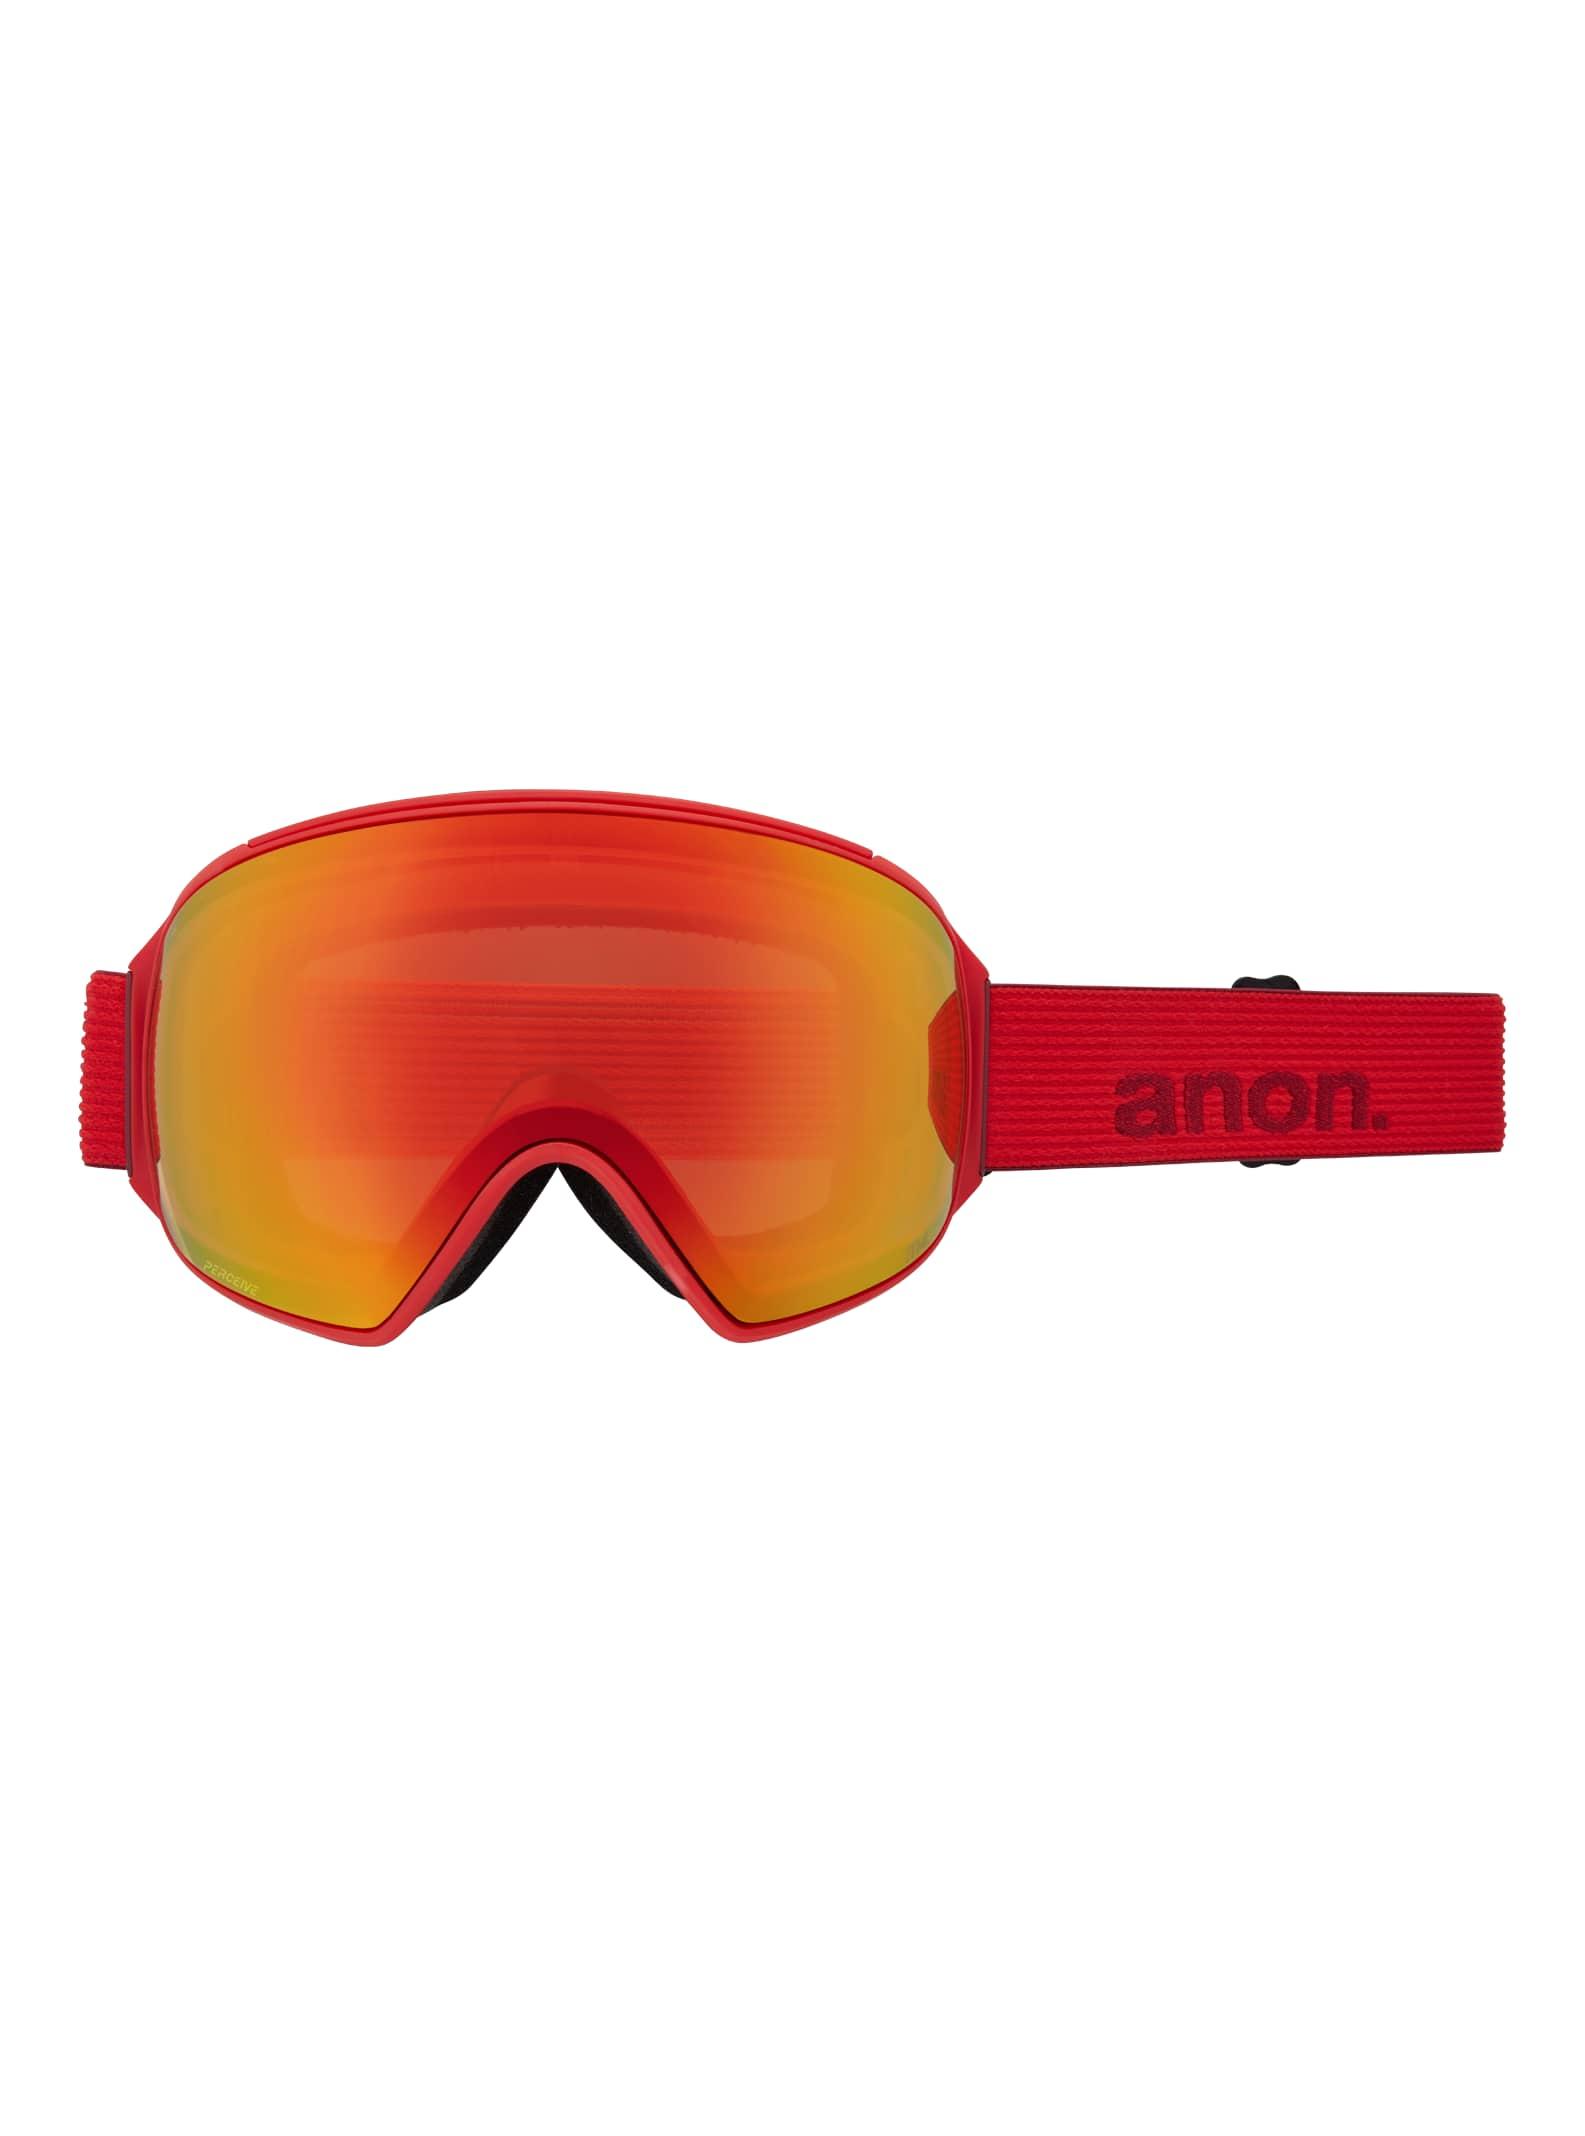 Men S Snowboard And Ski Goggles Anon Optics Us